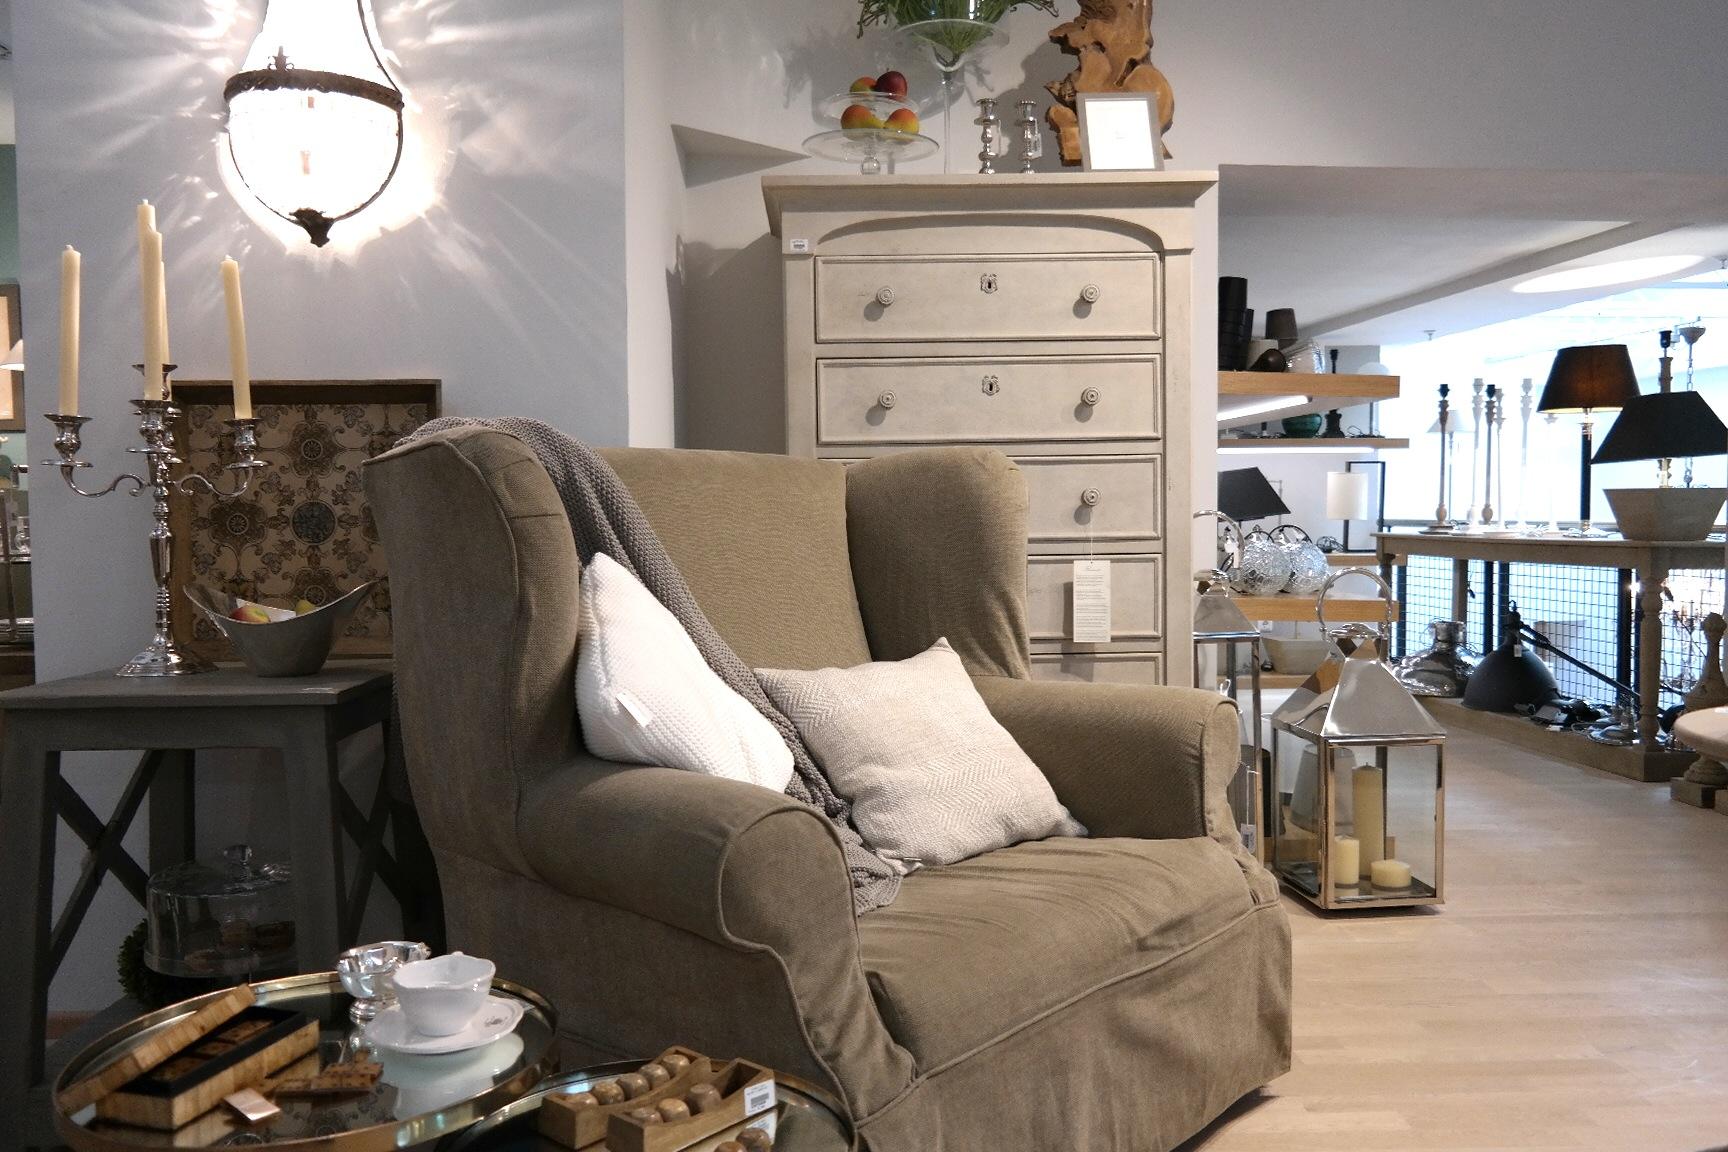 belgische m bel lifestyle blog aus bonn. Black Bedroom Furniture Sets. Home Design Ideas